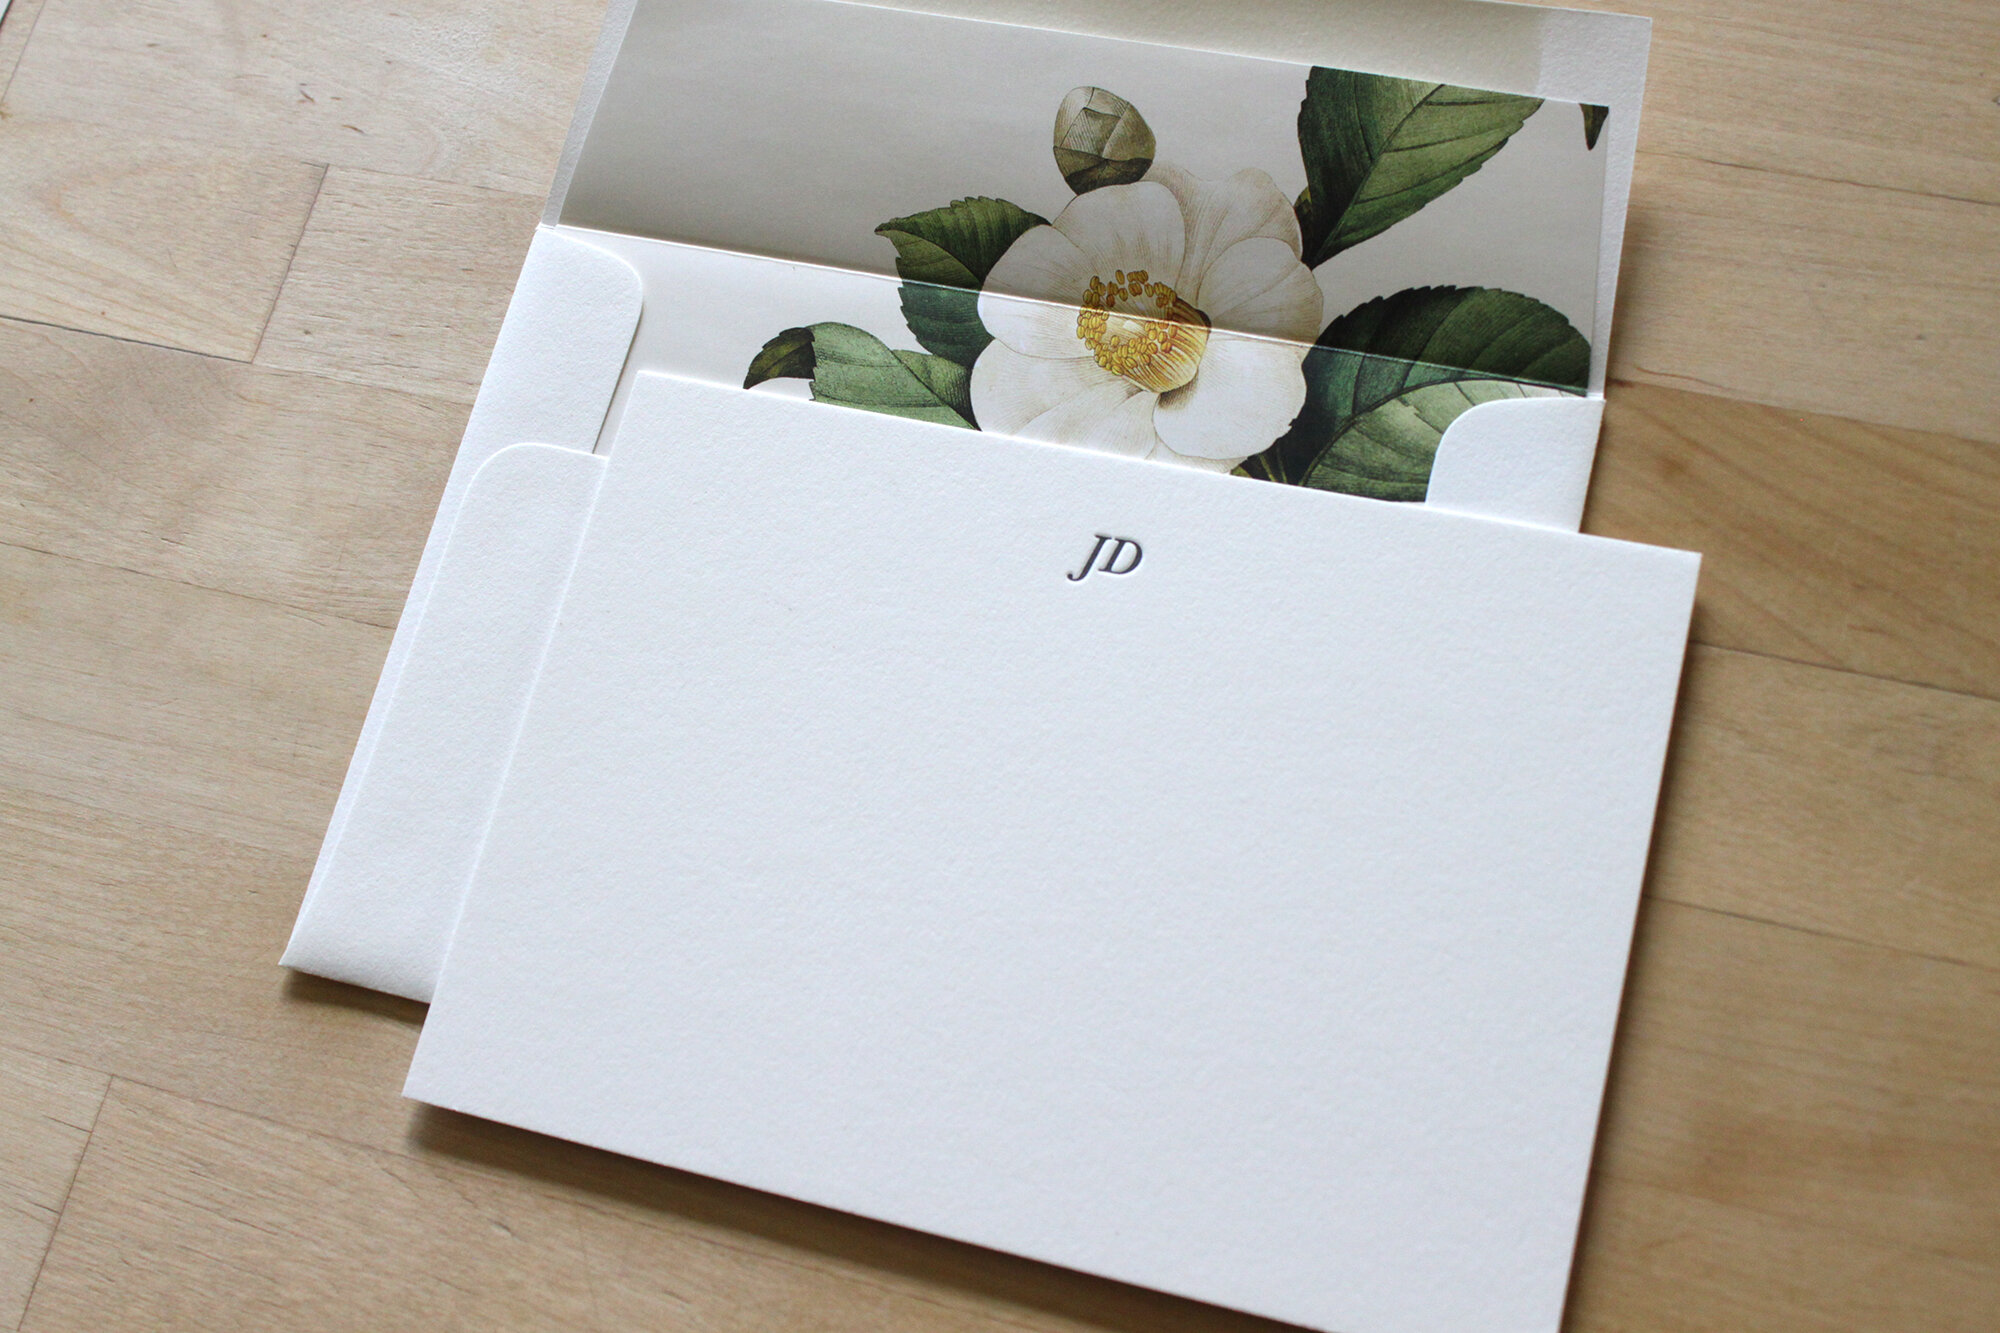 Personalized Custom Note Cards MARAIS Letterpress Stationery Set Classic Design